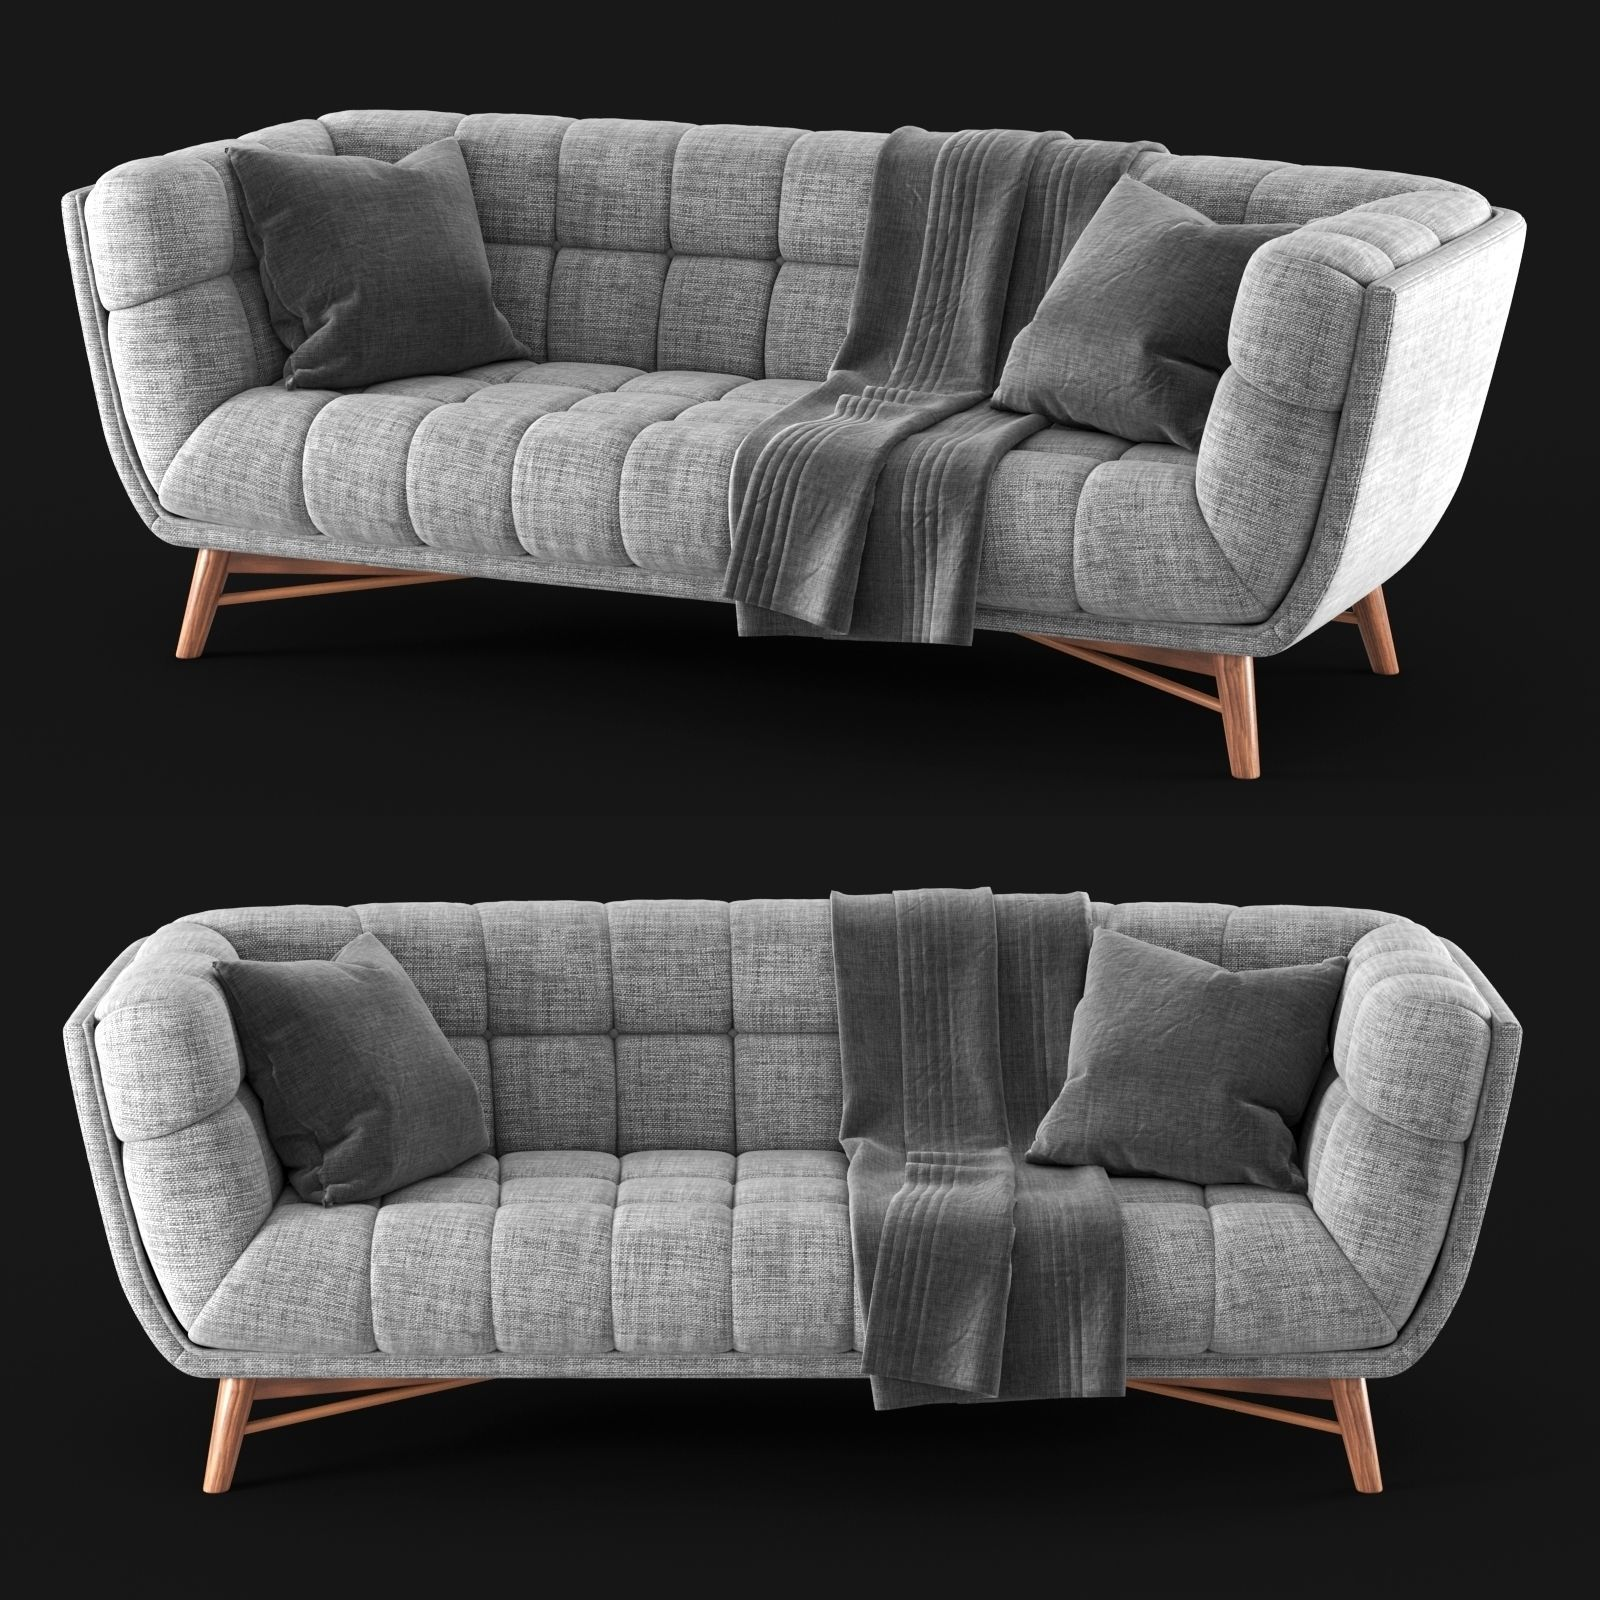 Lofton Midcentury Modern Sofa 3d Model